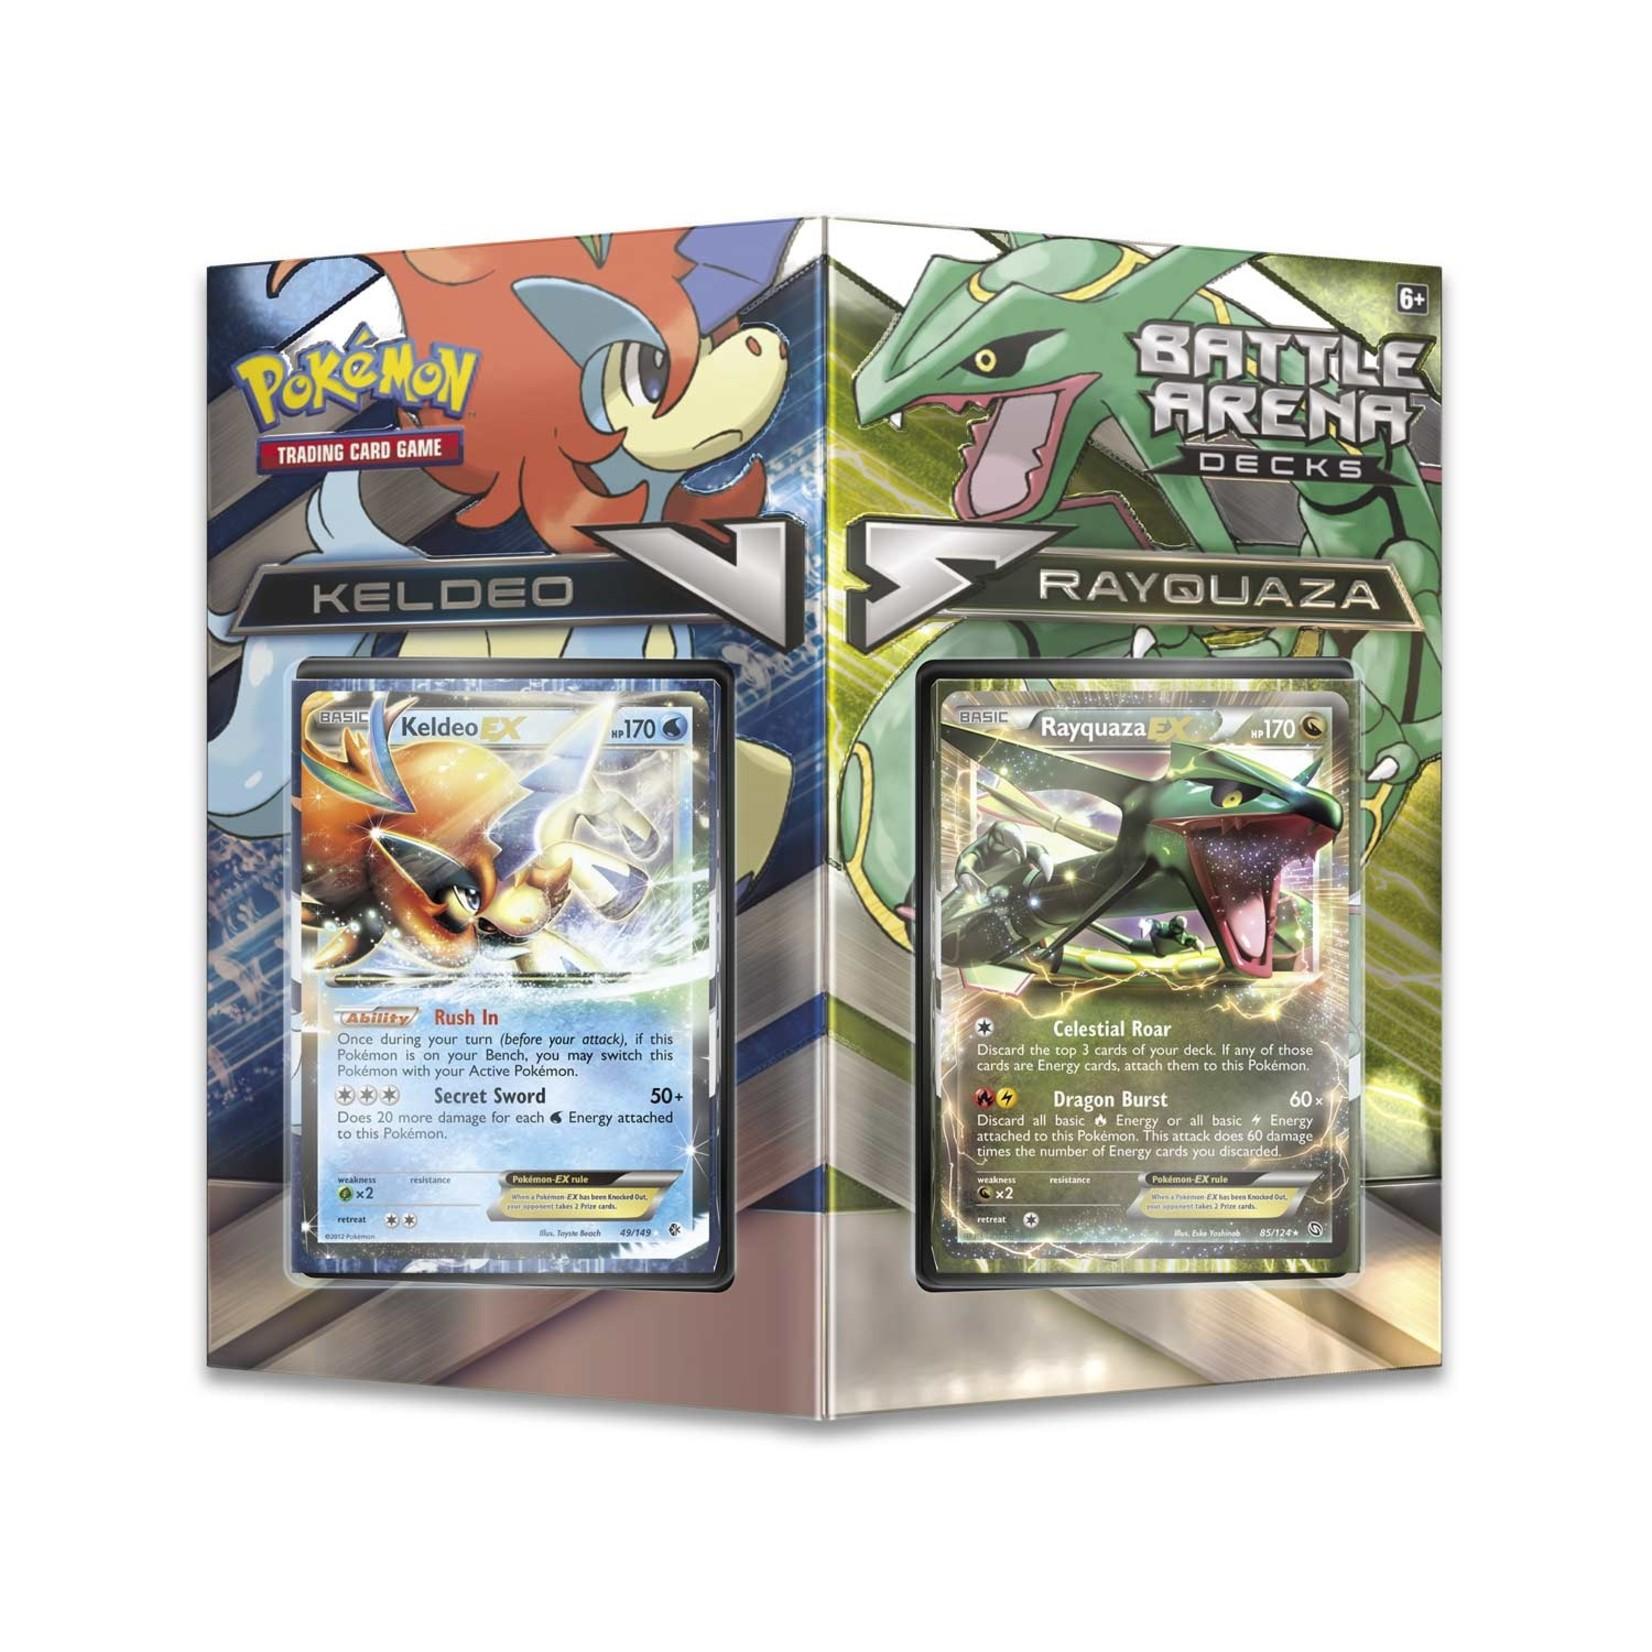 Pokemon TCG: Battle Arena Decks, Rayquaza vs. Keldeo